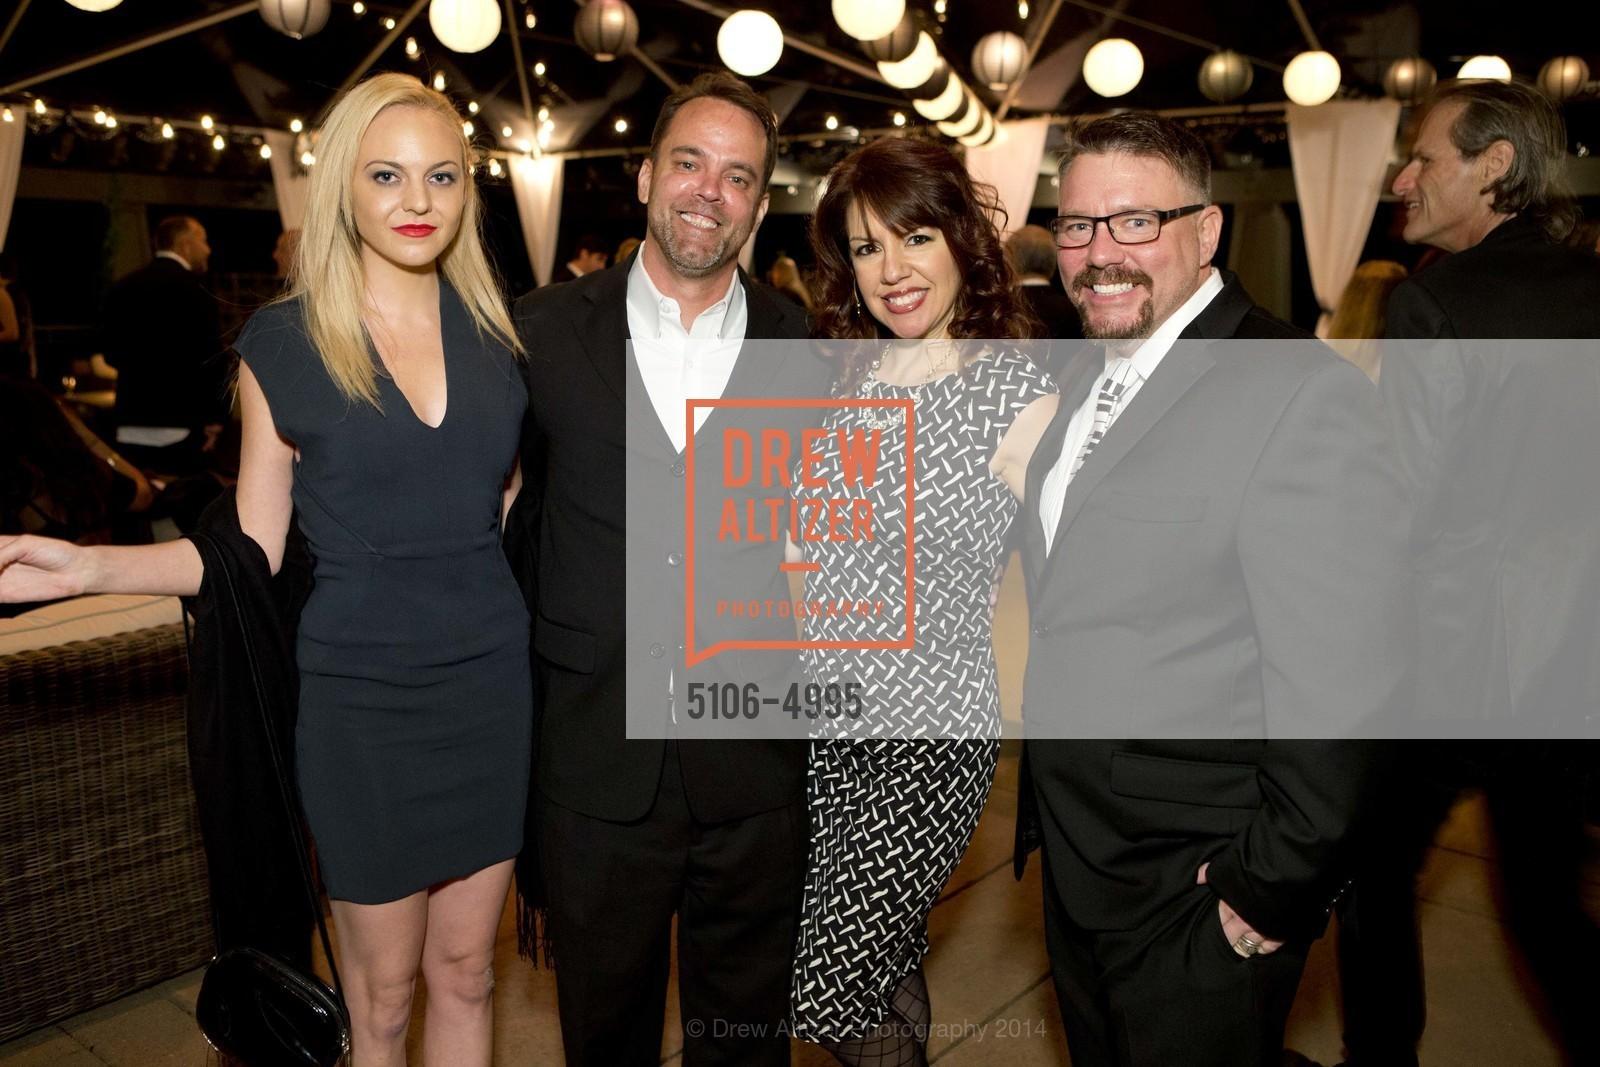 Rachel Fisher, Greg Baldwin, Shauna Burns-Staudt, Matty Staudt, Photo #5106-4995